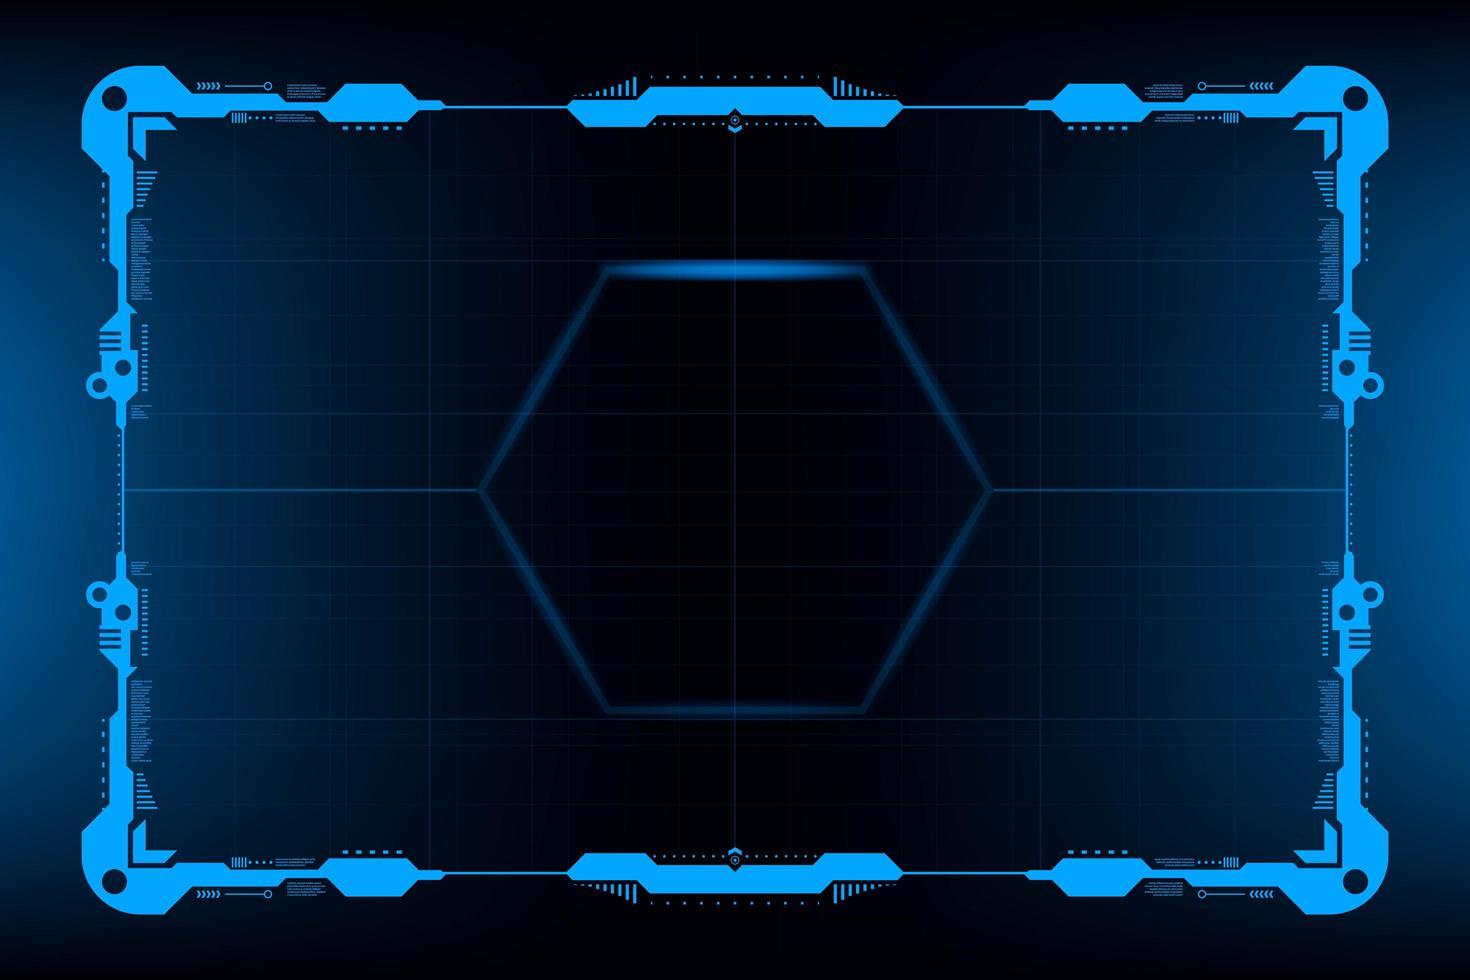 Painel HUD VR Interface do usuário vetor